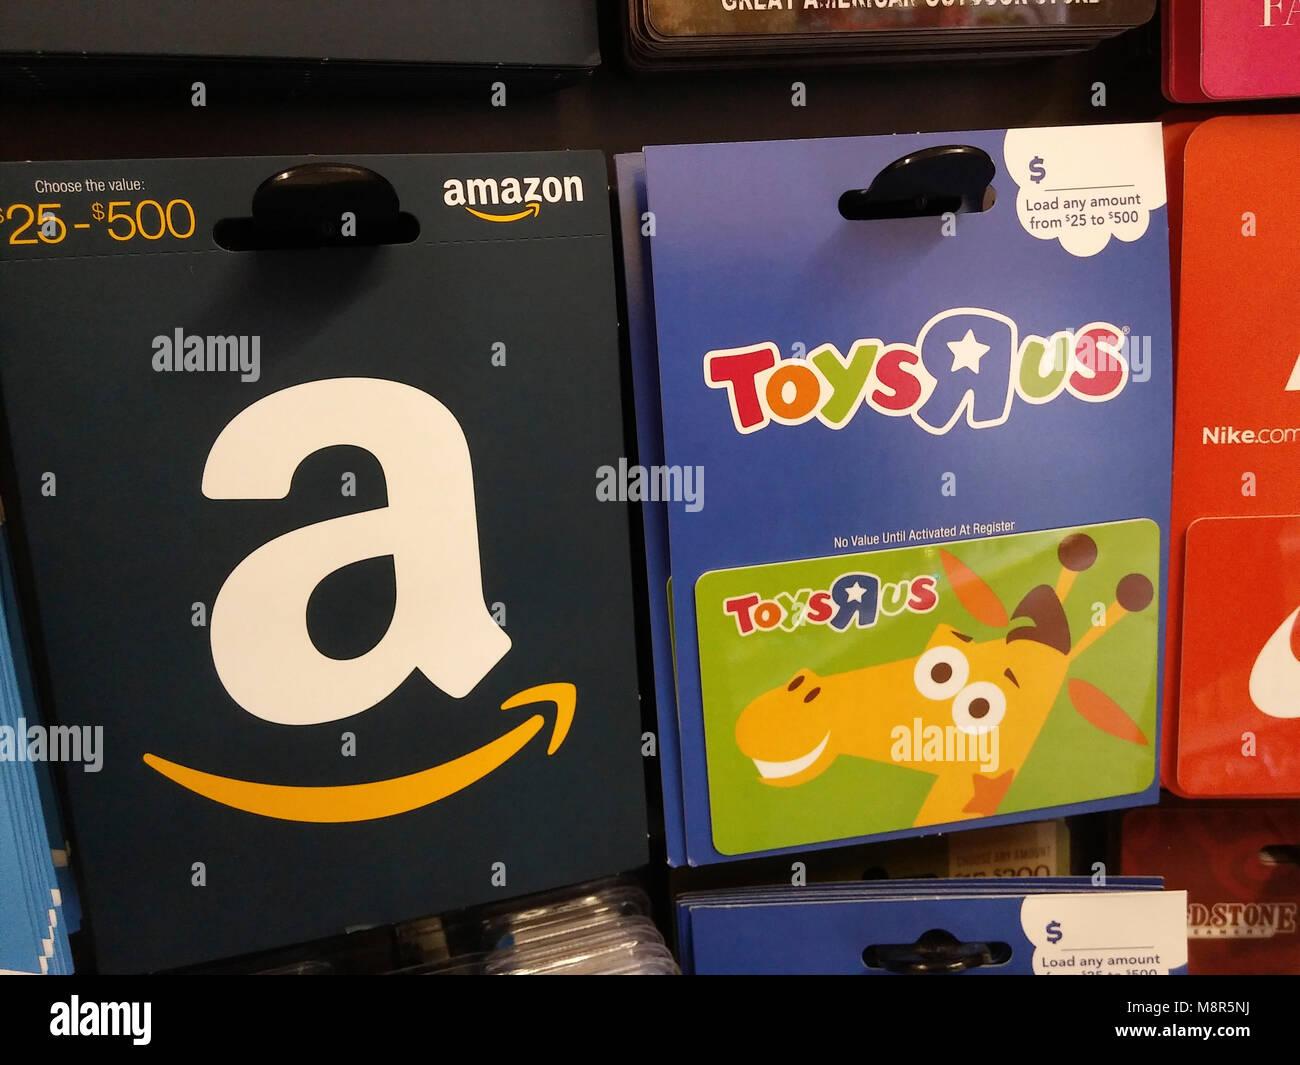 Amazon Gift Cards Stock Photos Amazon Gift Cards Stock Images Alamy